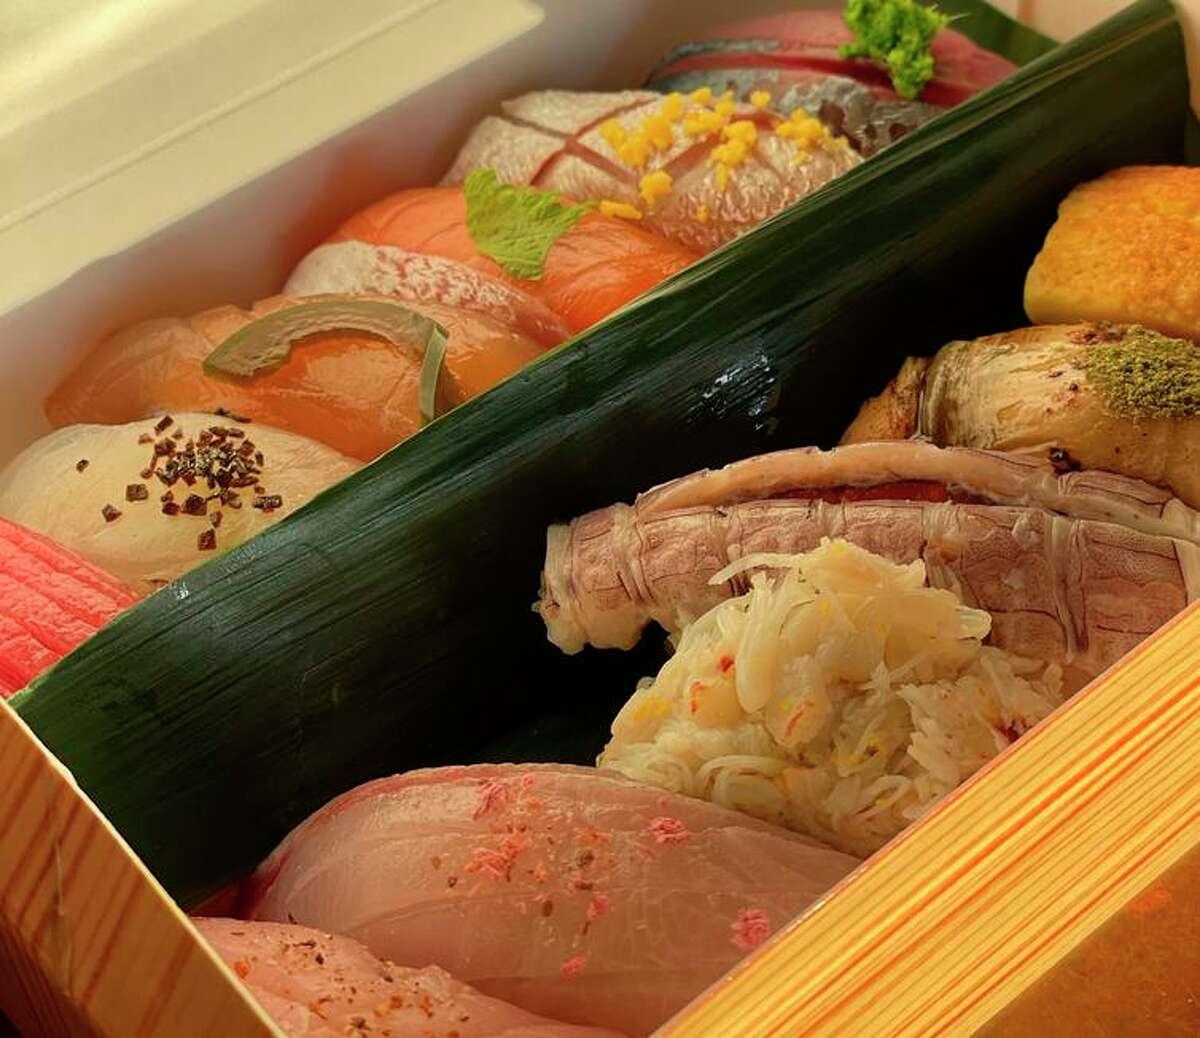 The takeout omakase from Sushi Salon, a pop-up by former Utzutzu employees Joji Nonaka and Anna Osawa.